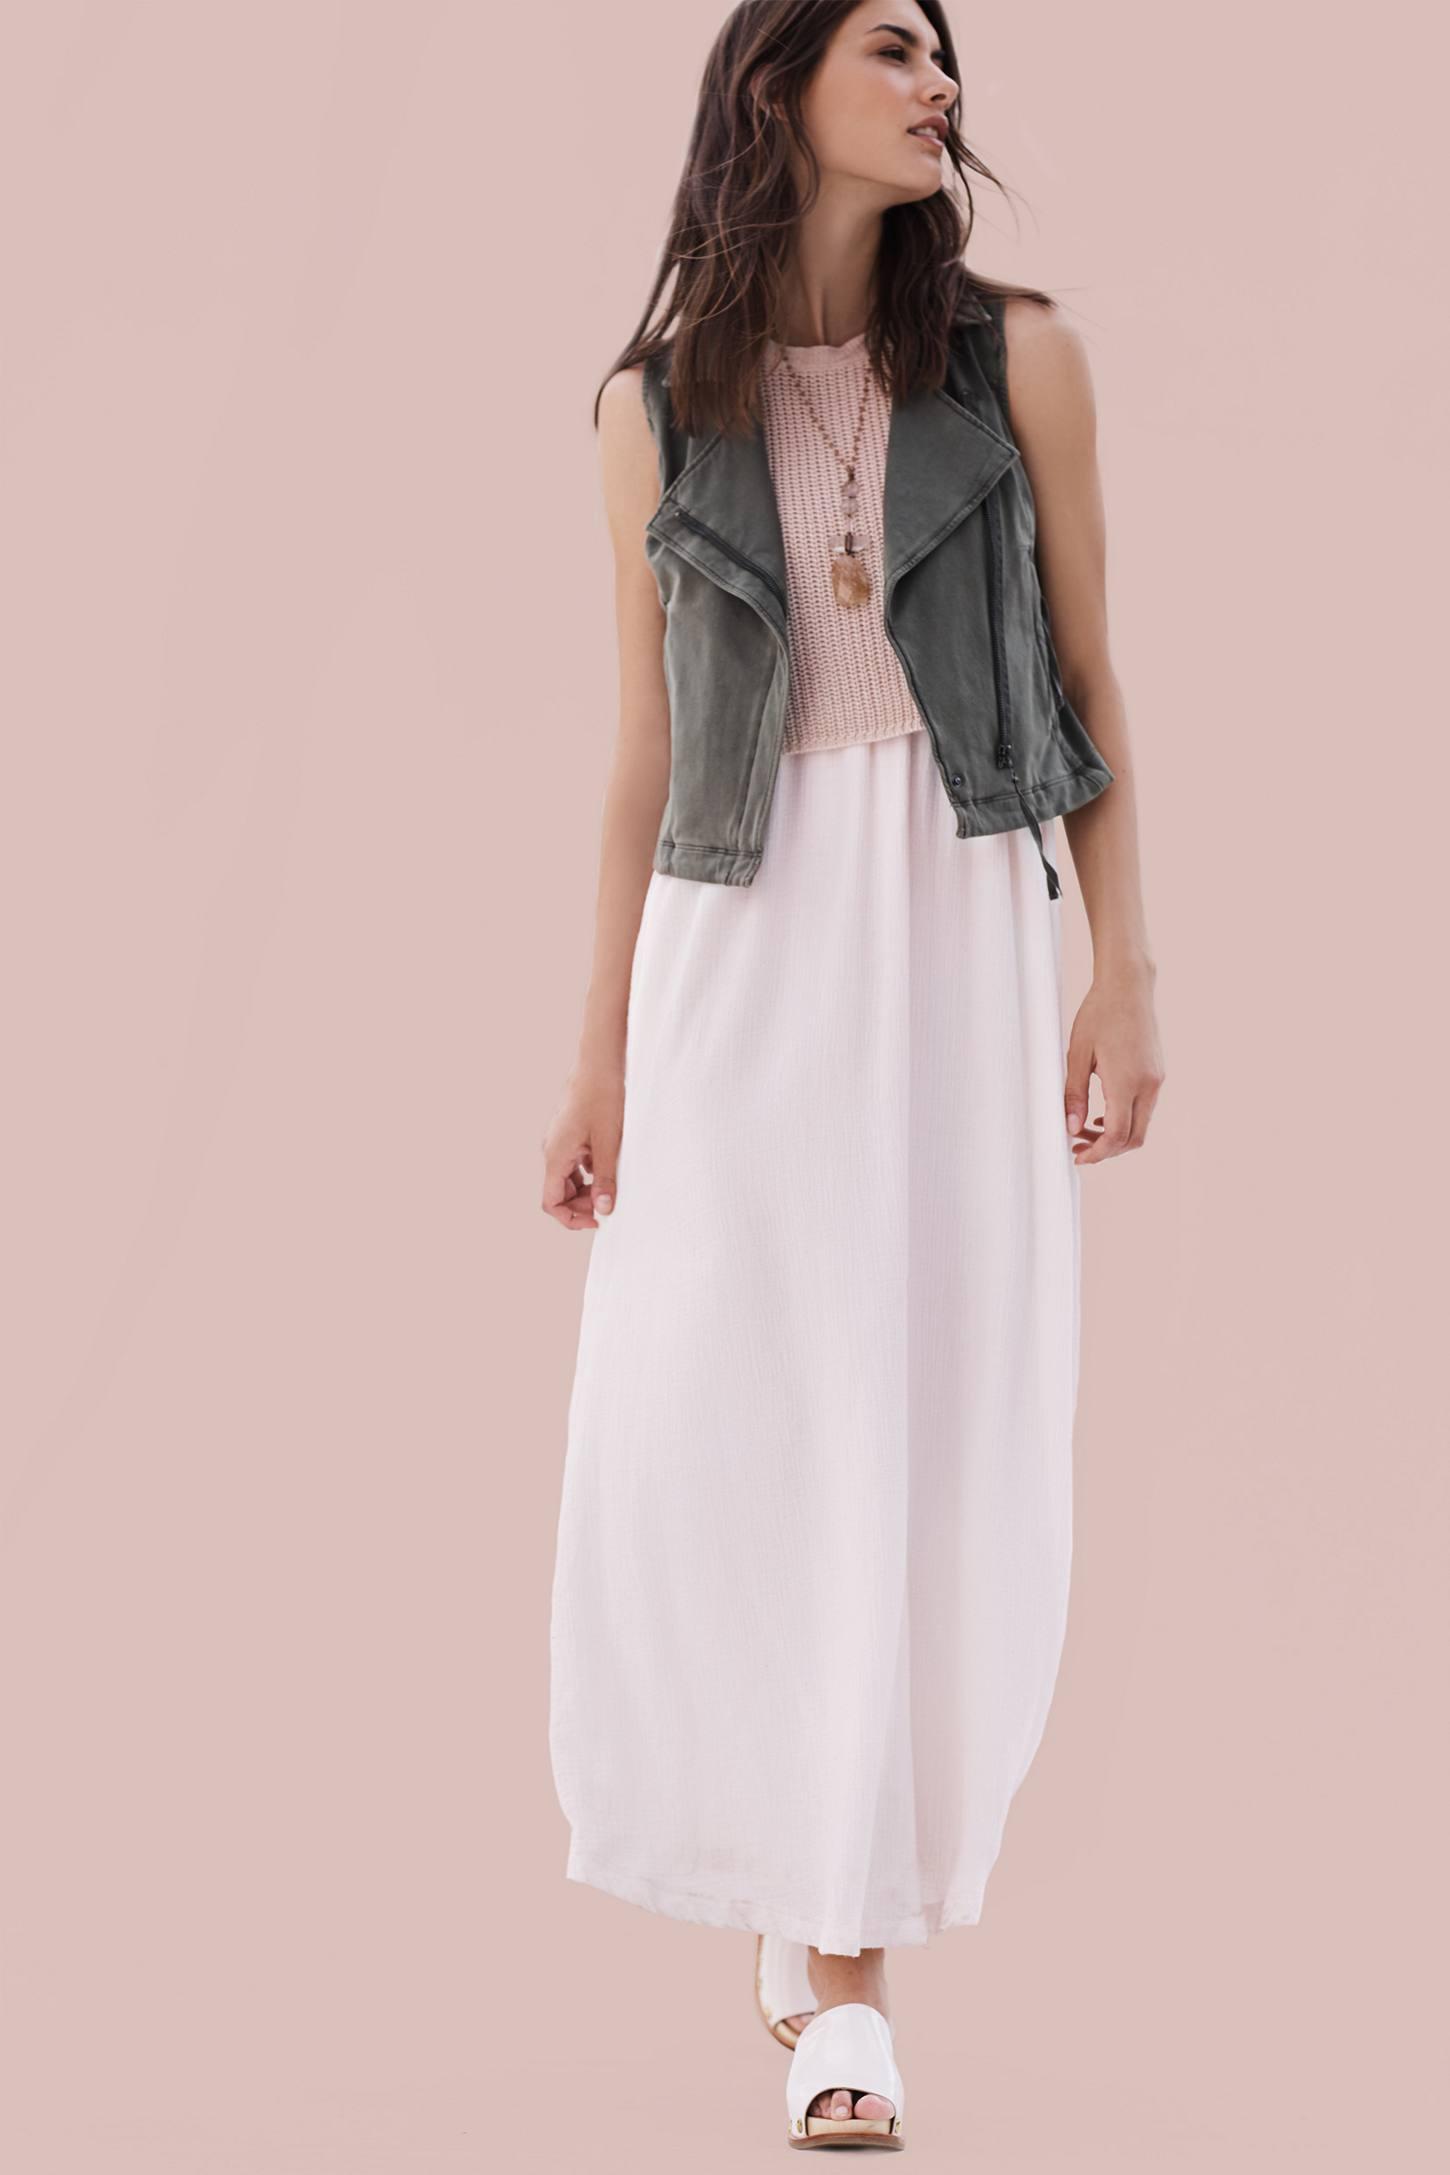 Layered Sandstone Maxi Dress   Anthropologie